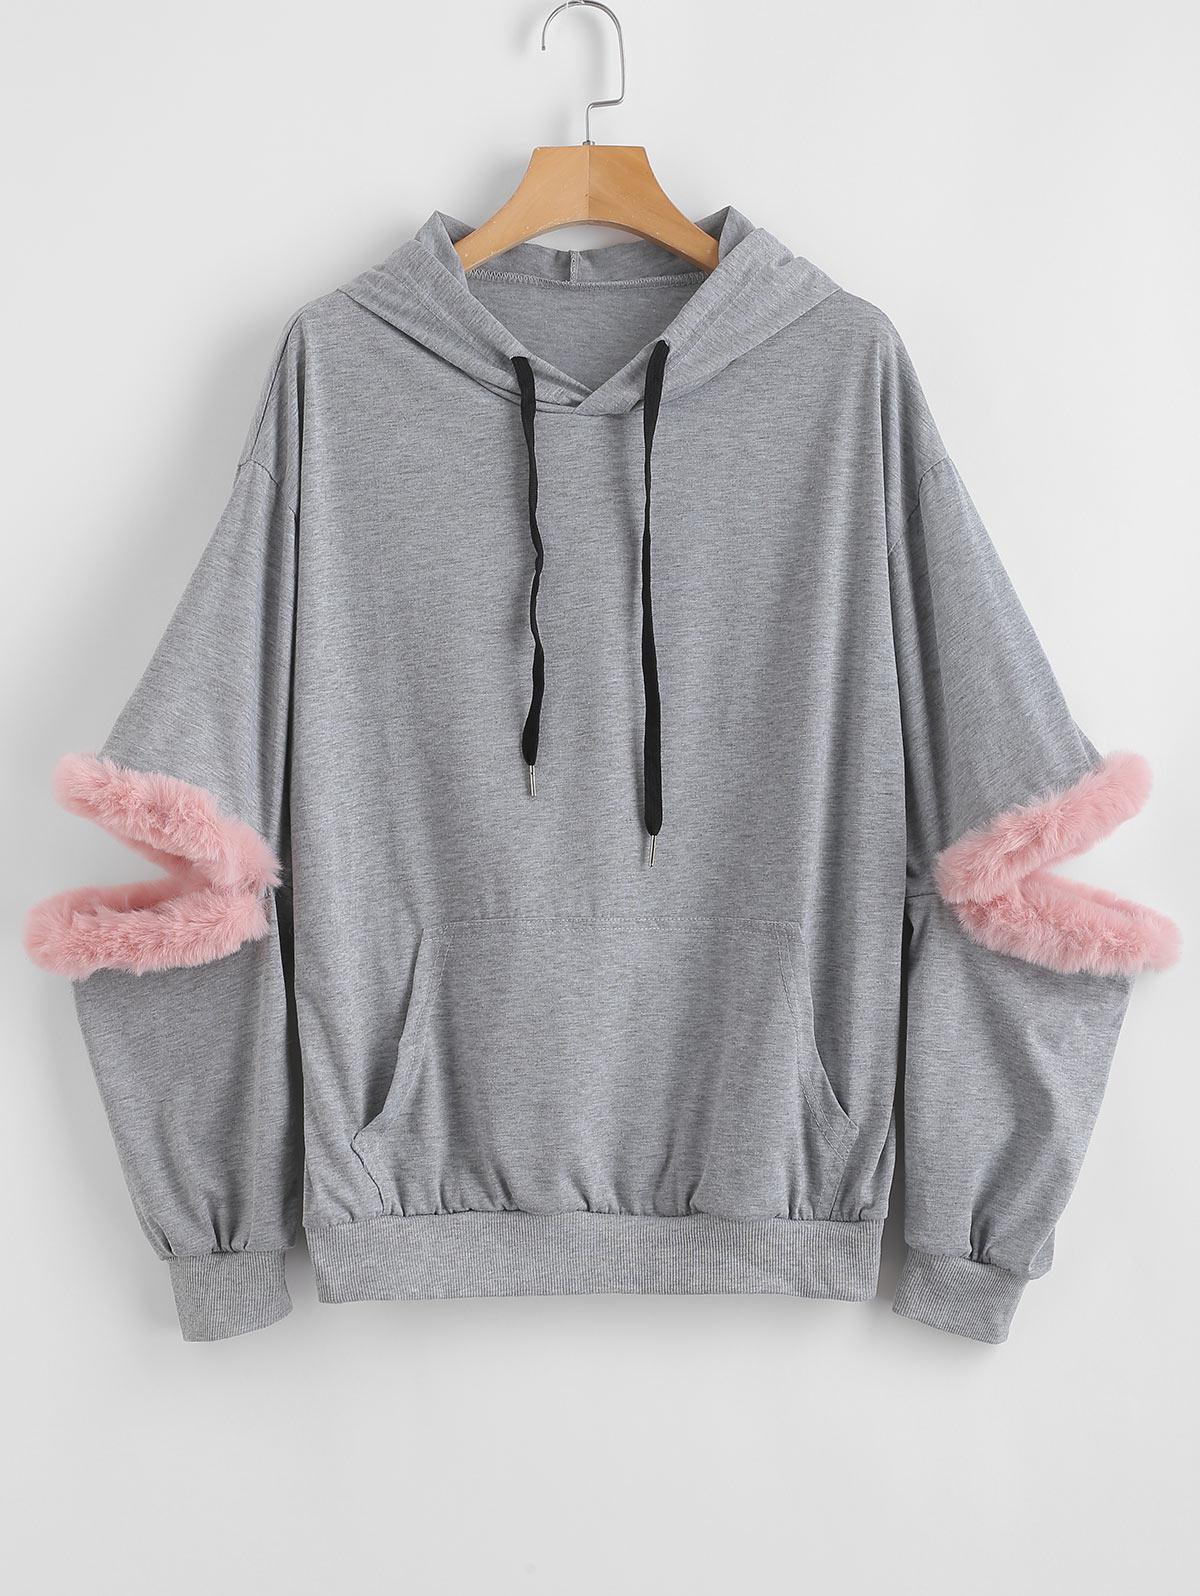 Zaful | GRAY CLOUD Faux Fur Trim Front Pocket Hoodie | Clouty